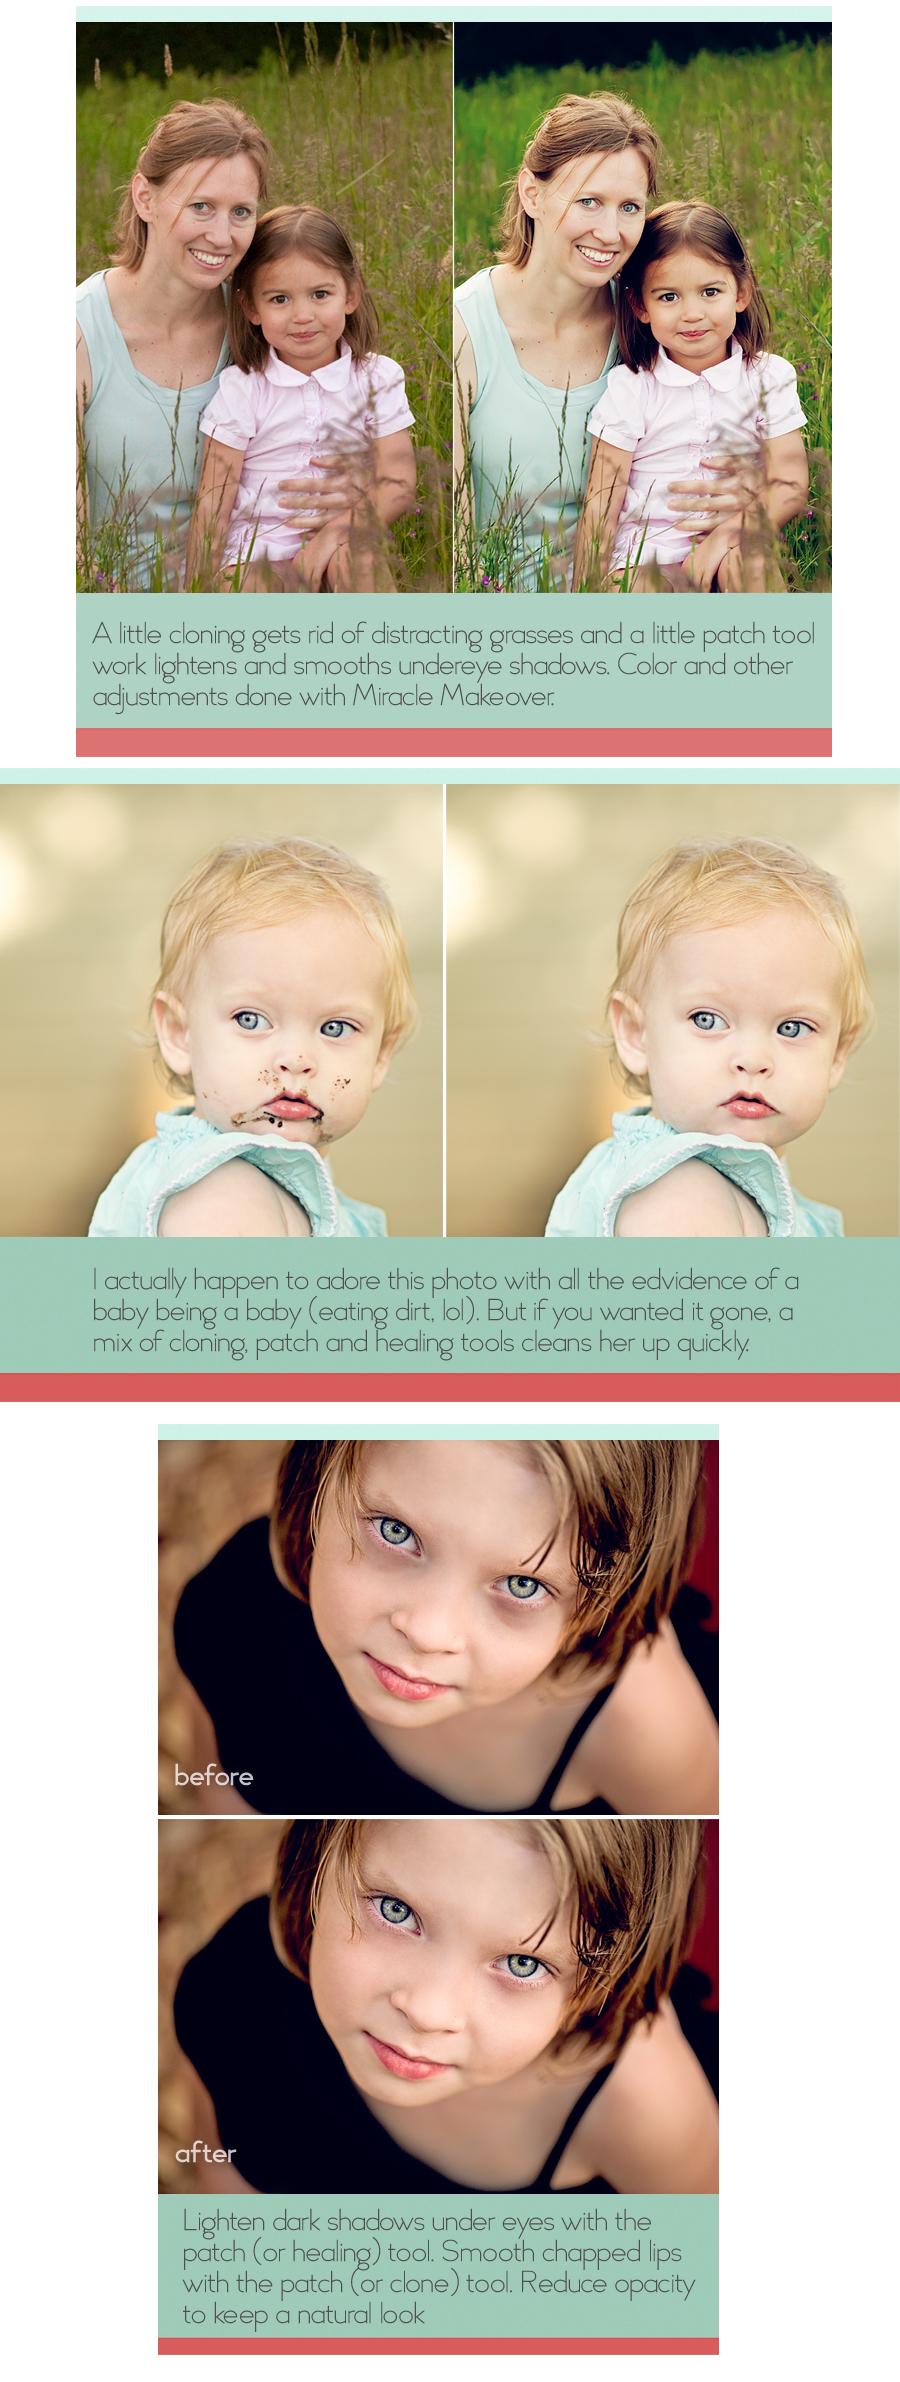 Photoshop Actions Elements PSE Clone Tool Healing Brush Blemishes Eyes